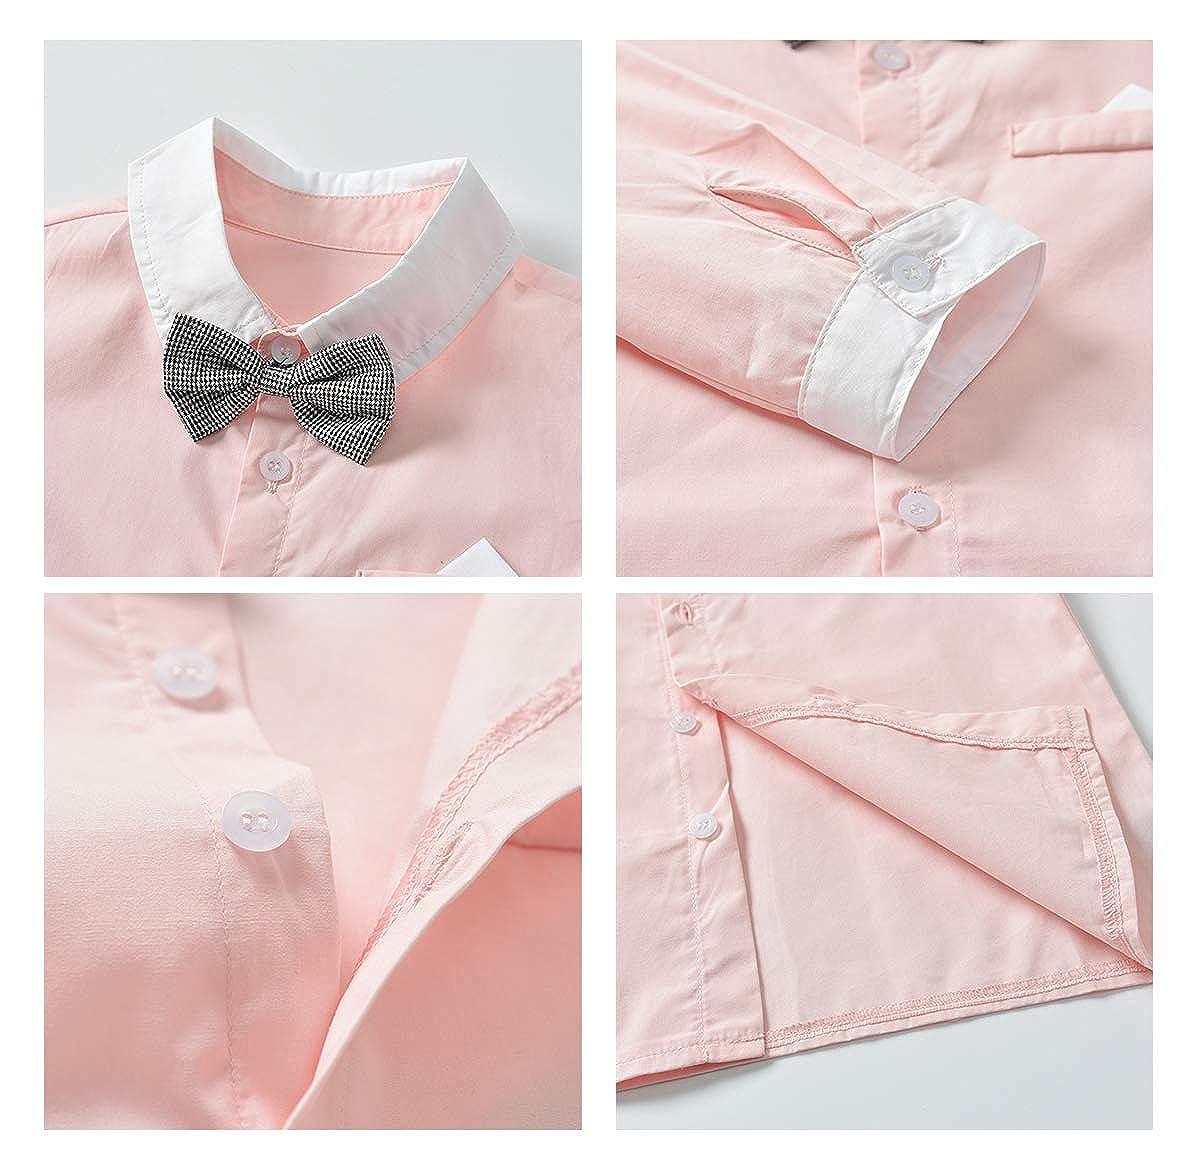 Civil Boy Clothes Set with Bow Tie Shirt and Suspender Straps Pants